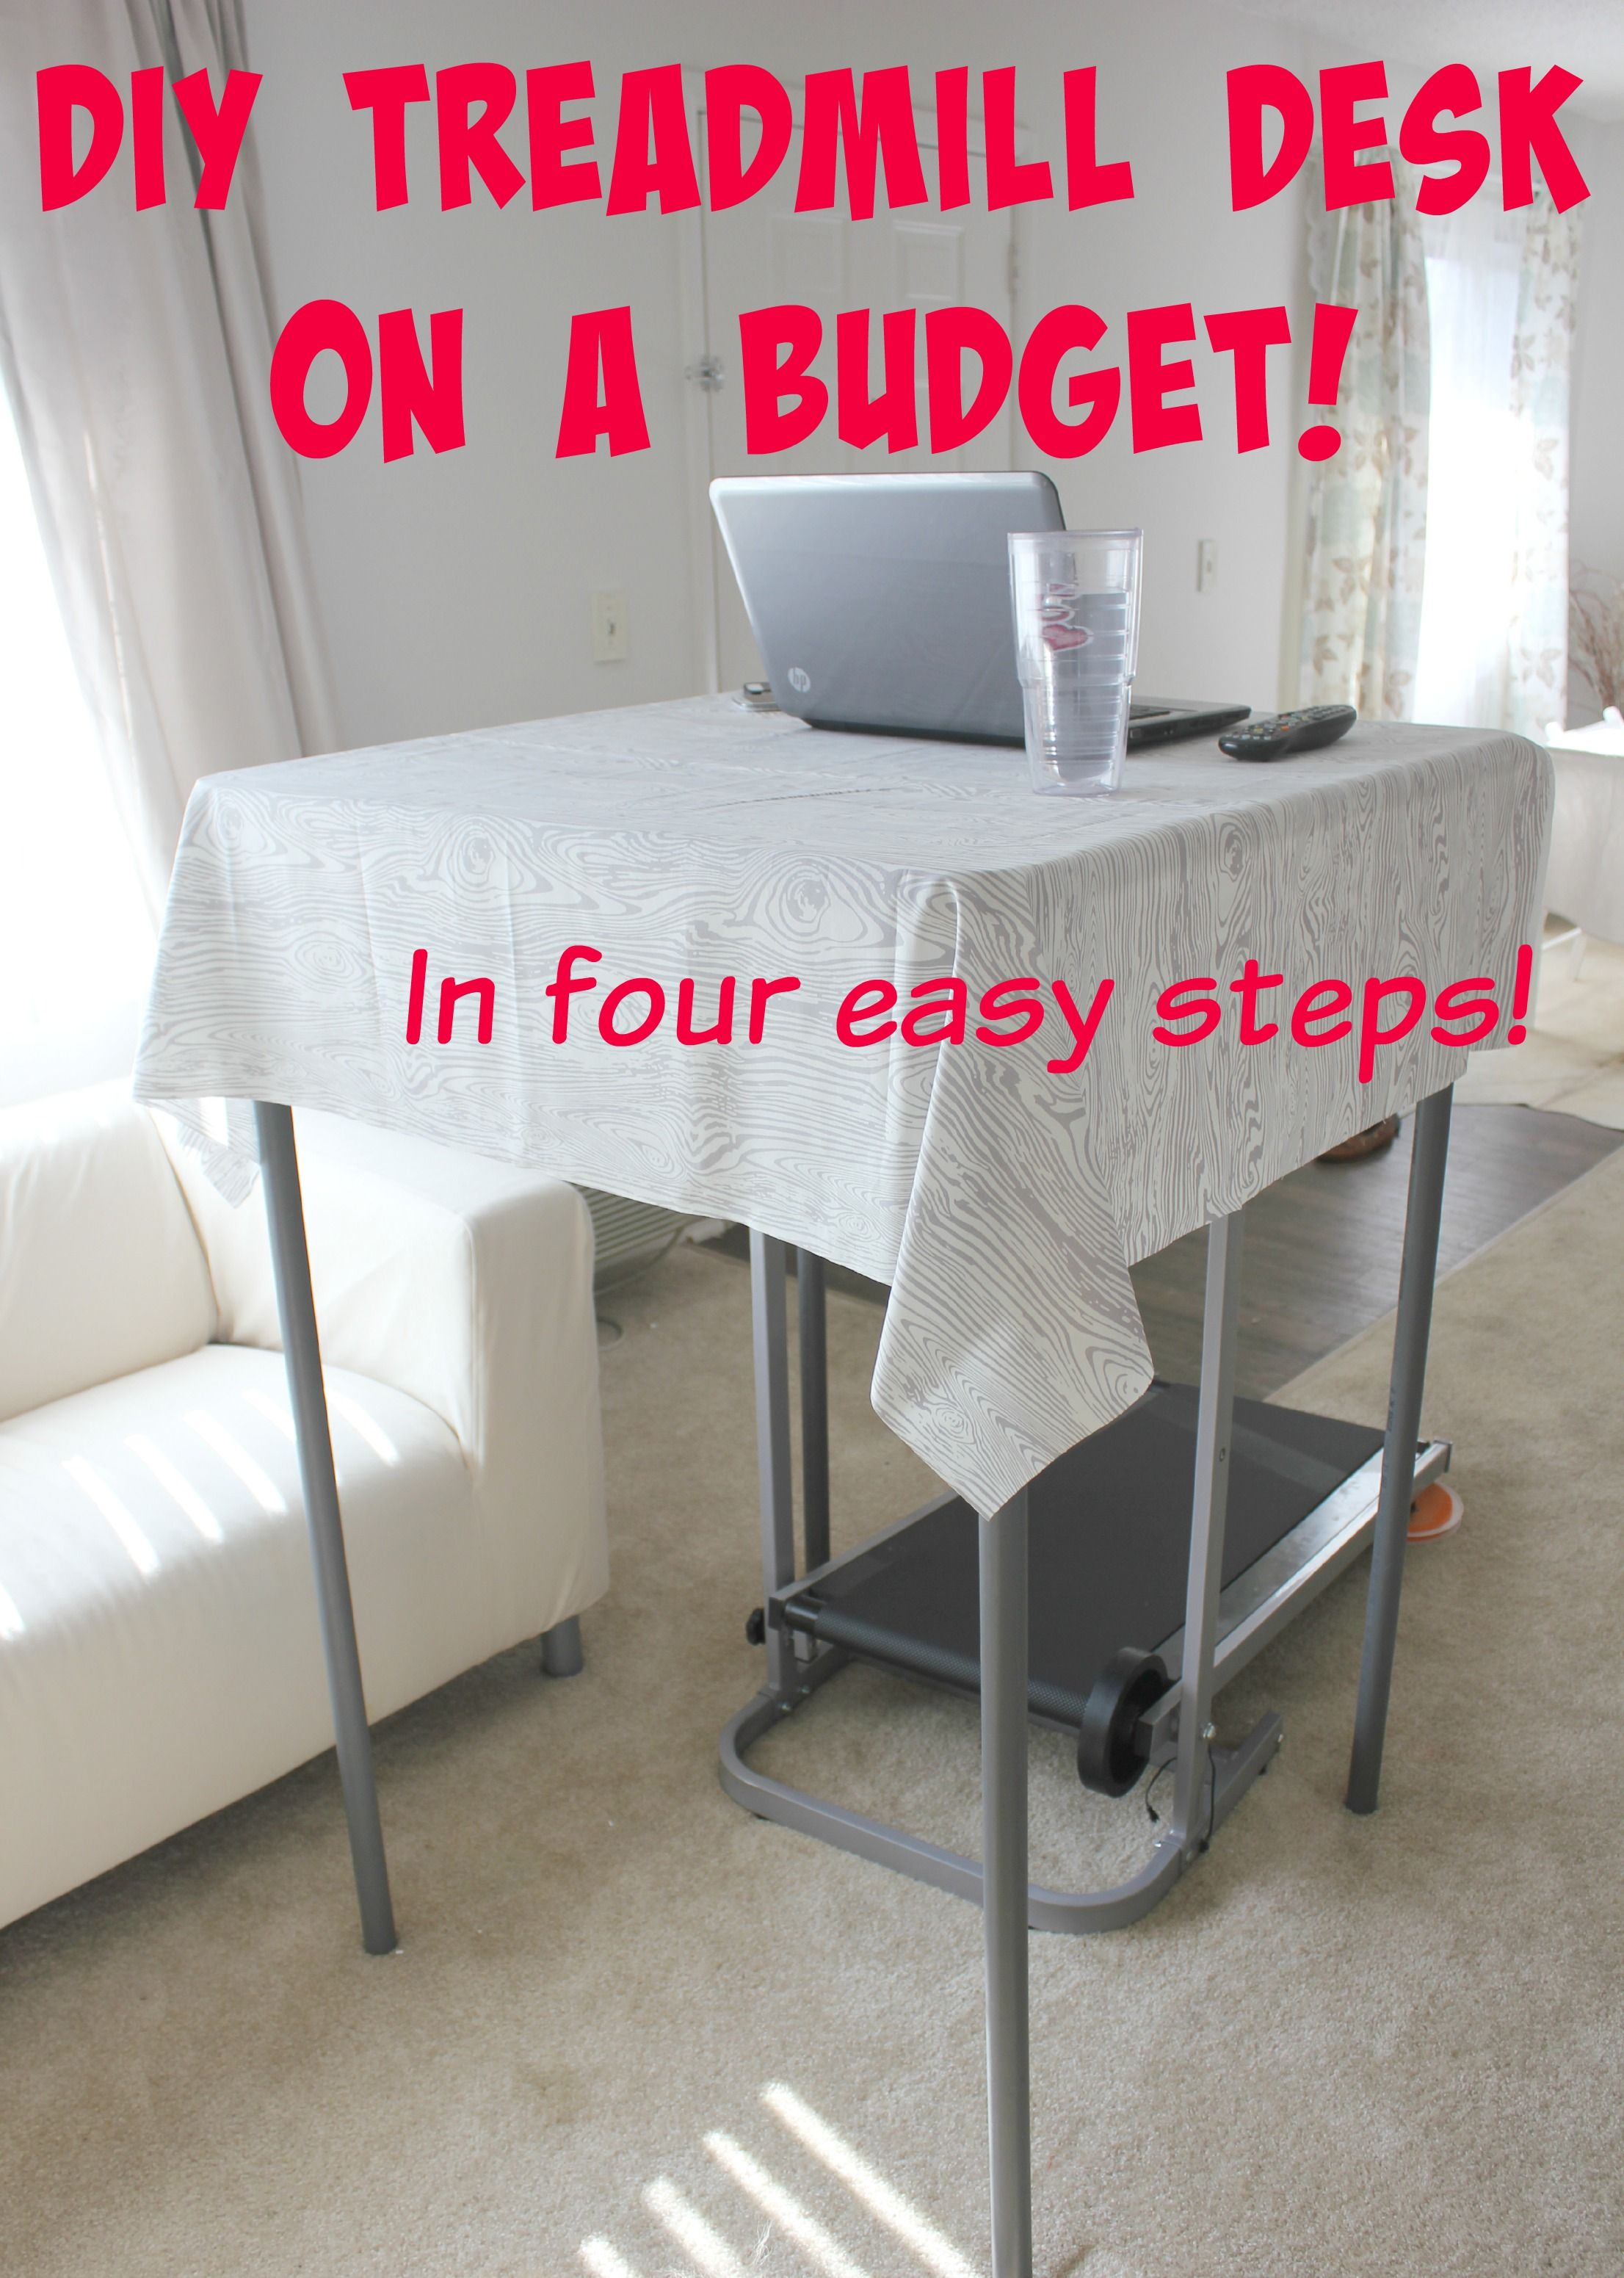 Diy treadmill desk with images treadmill desk home